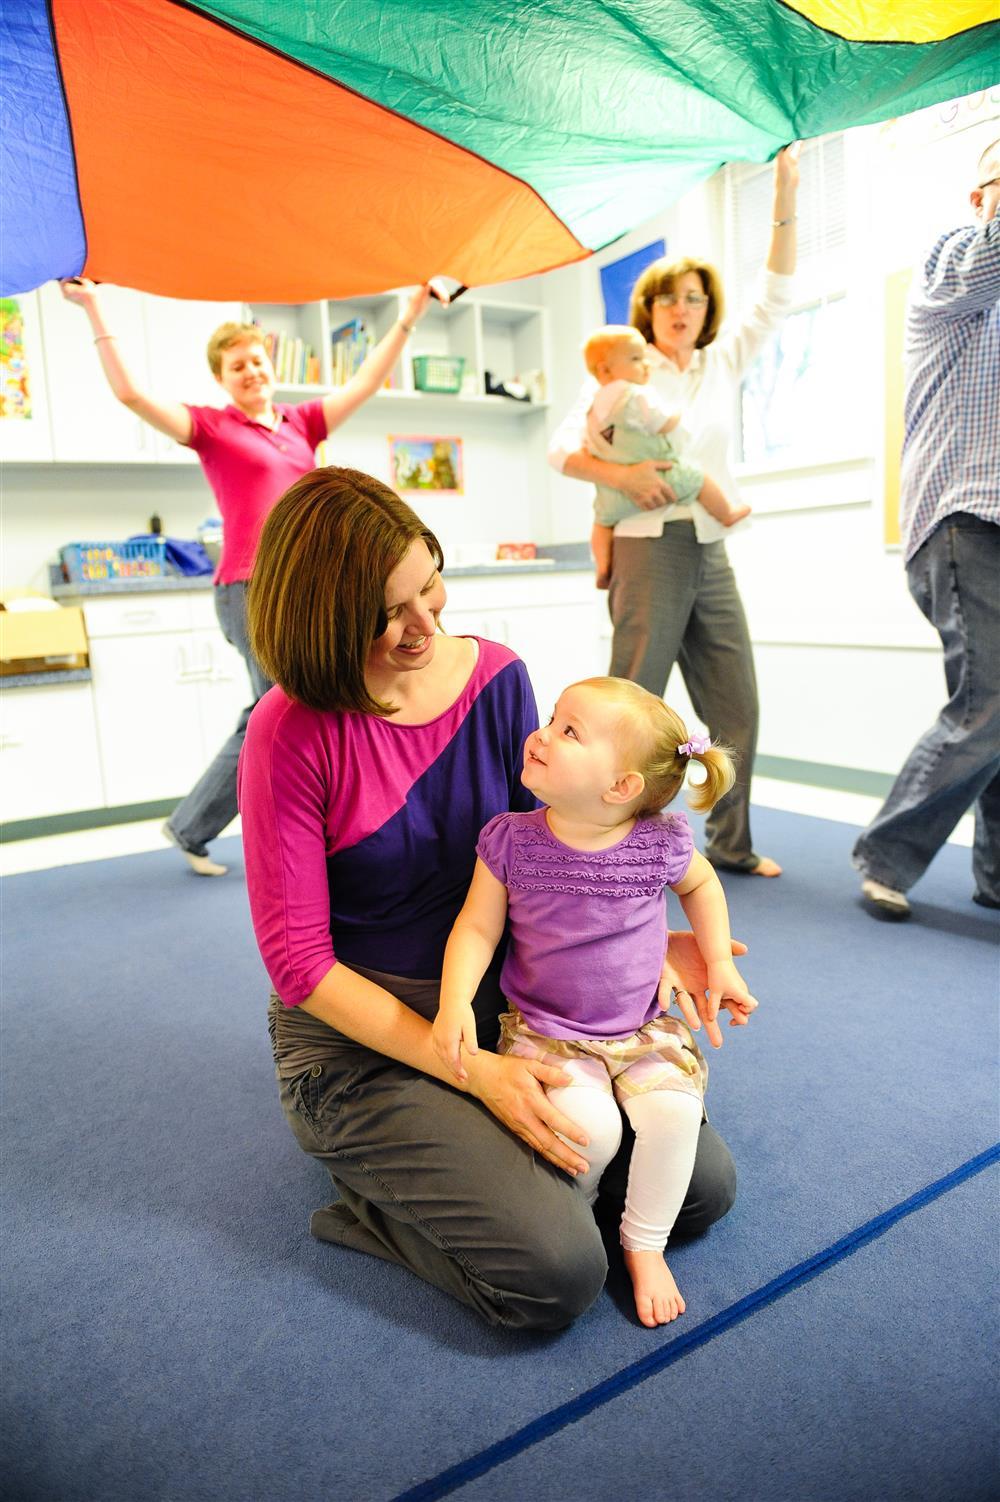 Photo-Kindermusik-YoungToddler-Mom-Girl-Parachute-Play.jpg